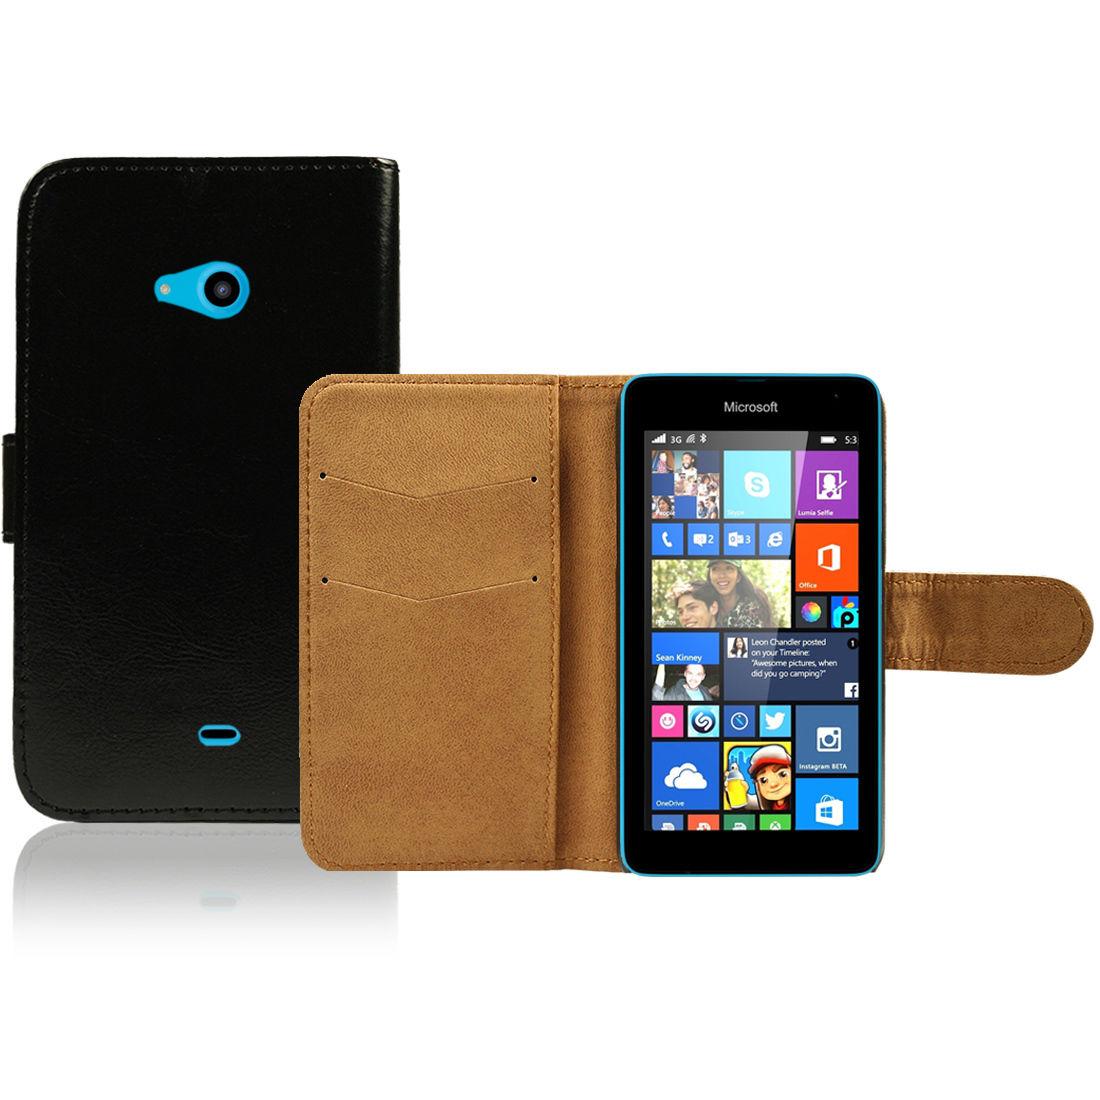 Pouzdro pro Microsoft Lumia 535 černé